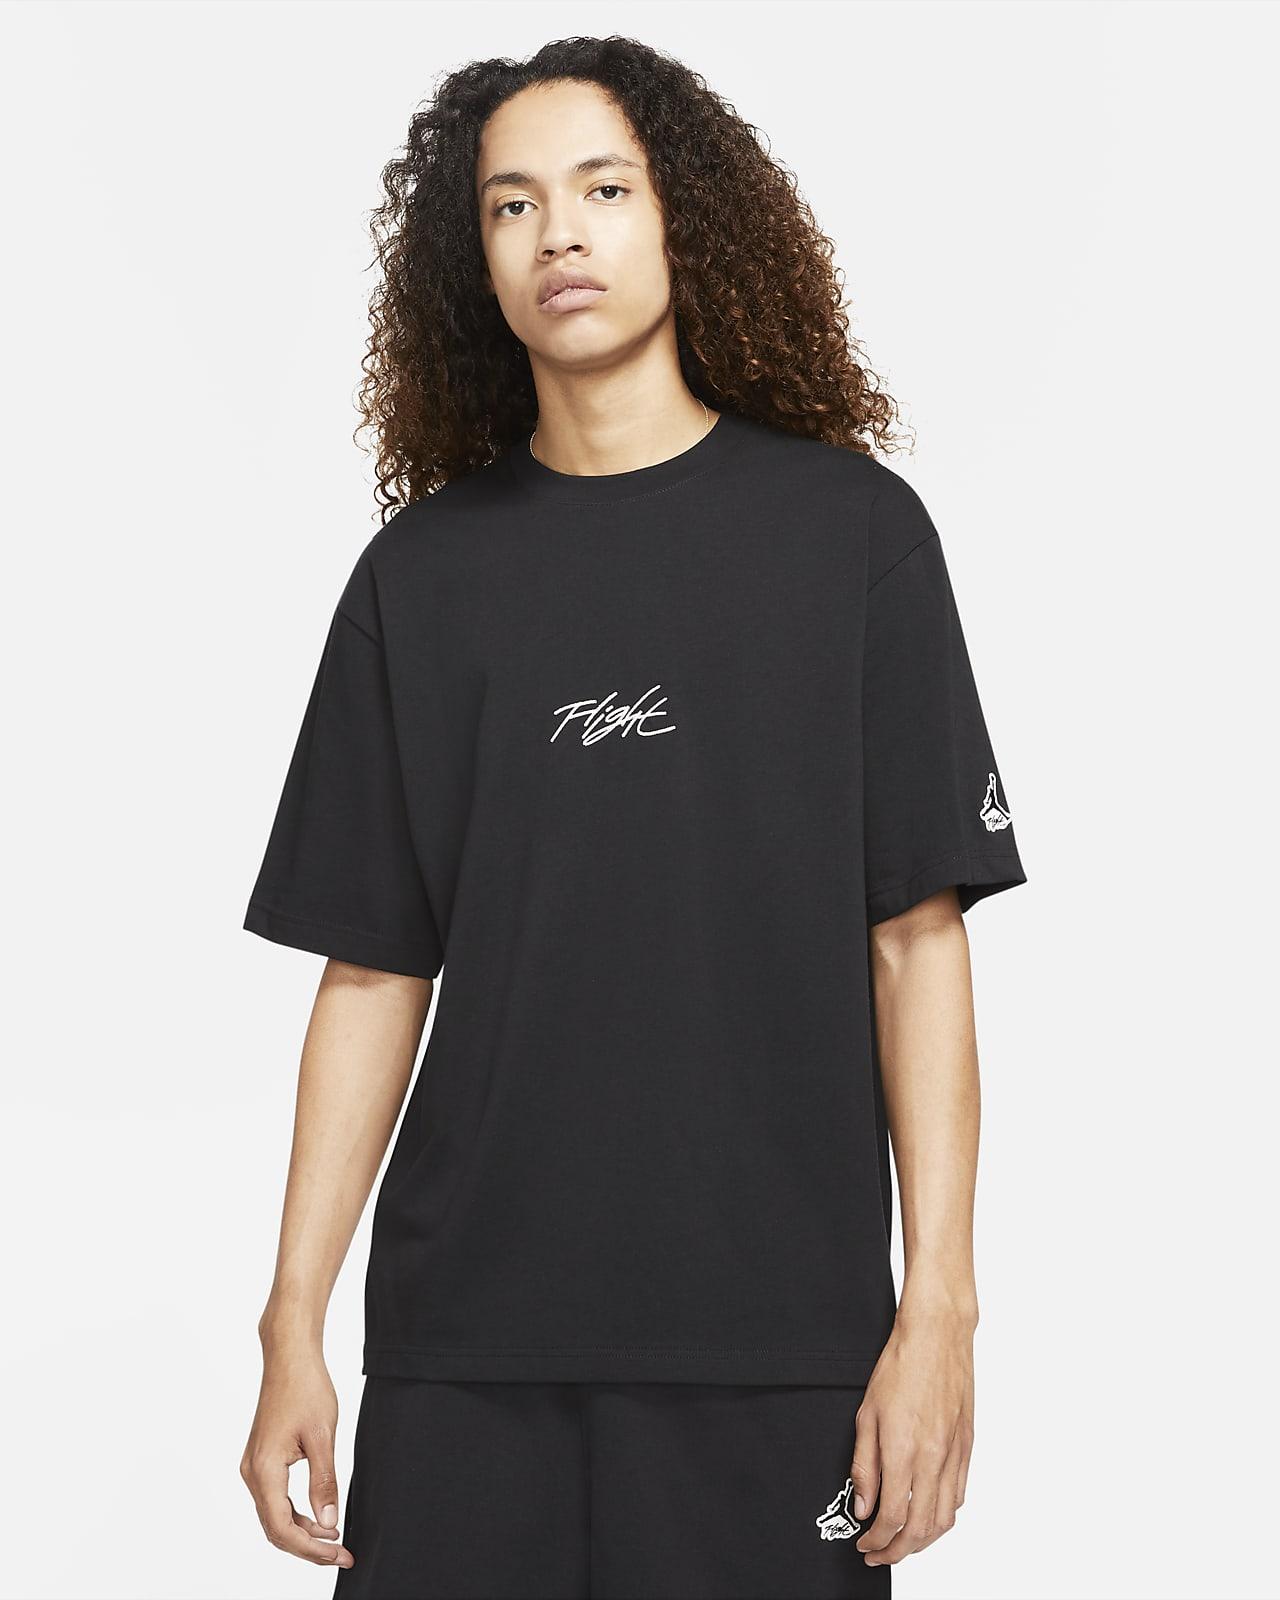 Jordan Flight Essentials 男款短袖 T 恤